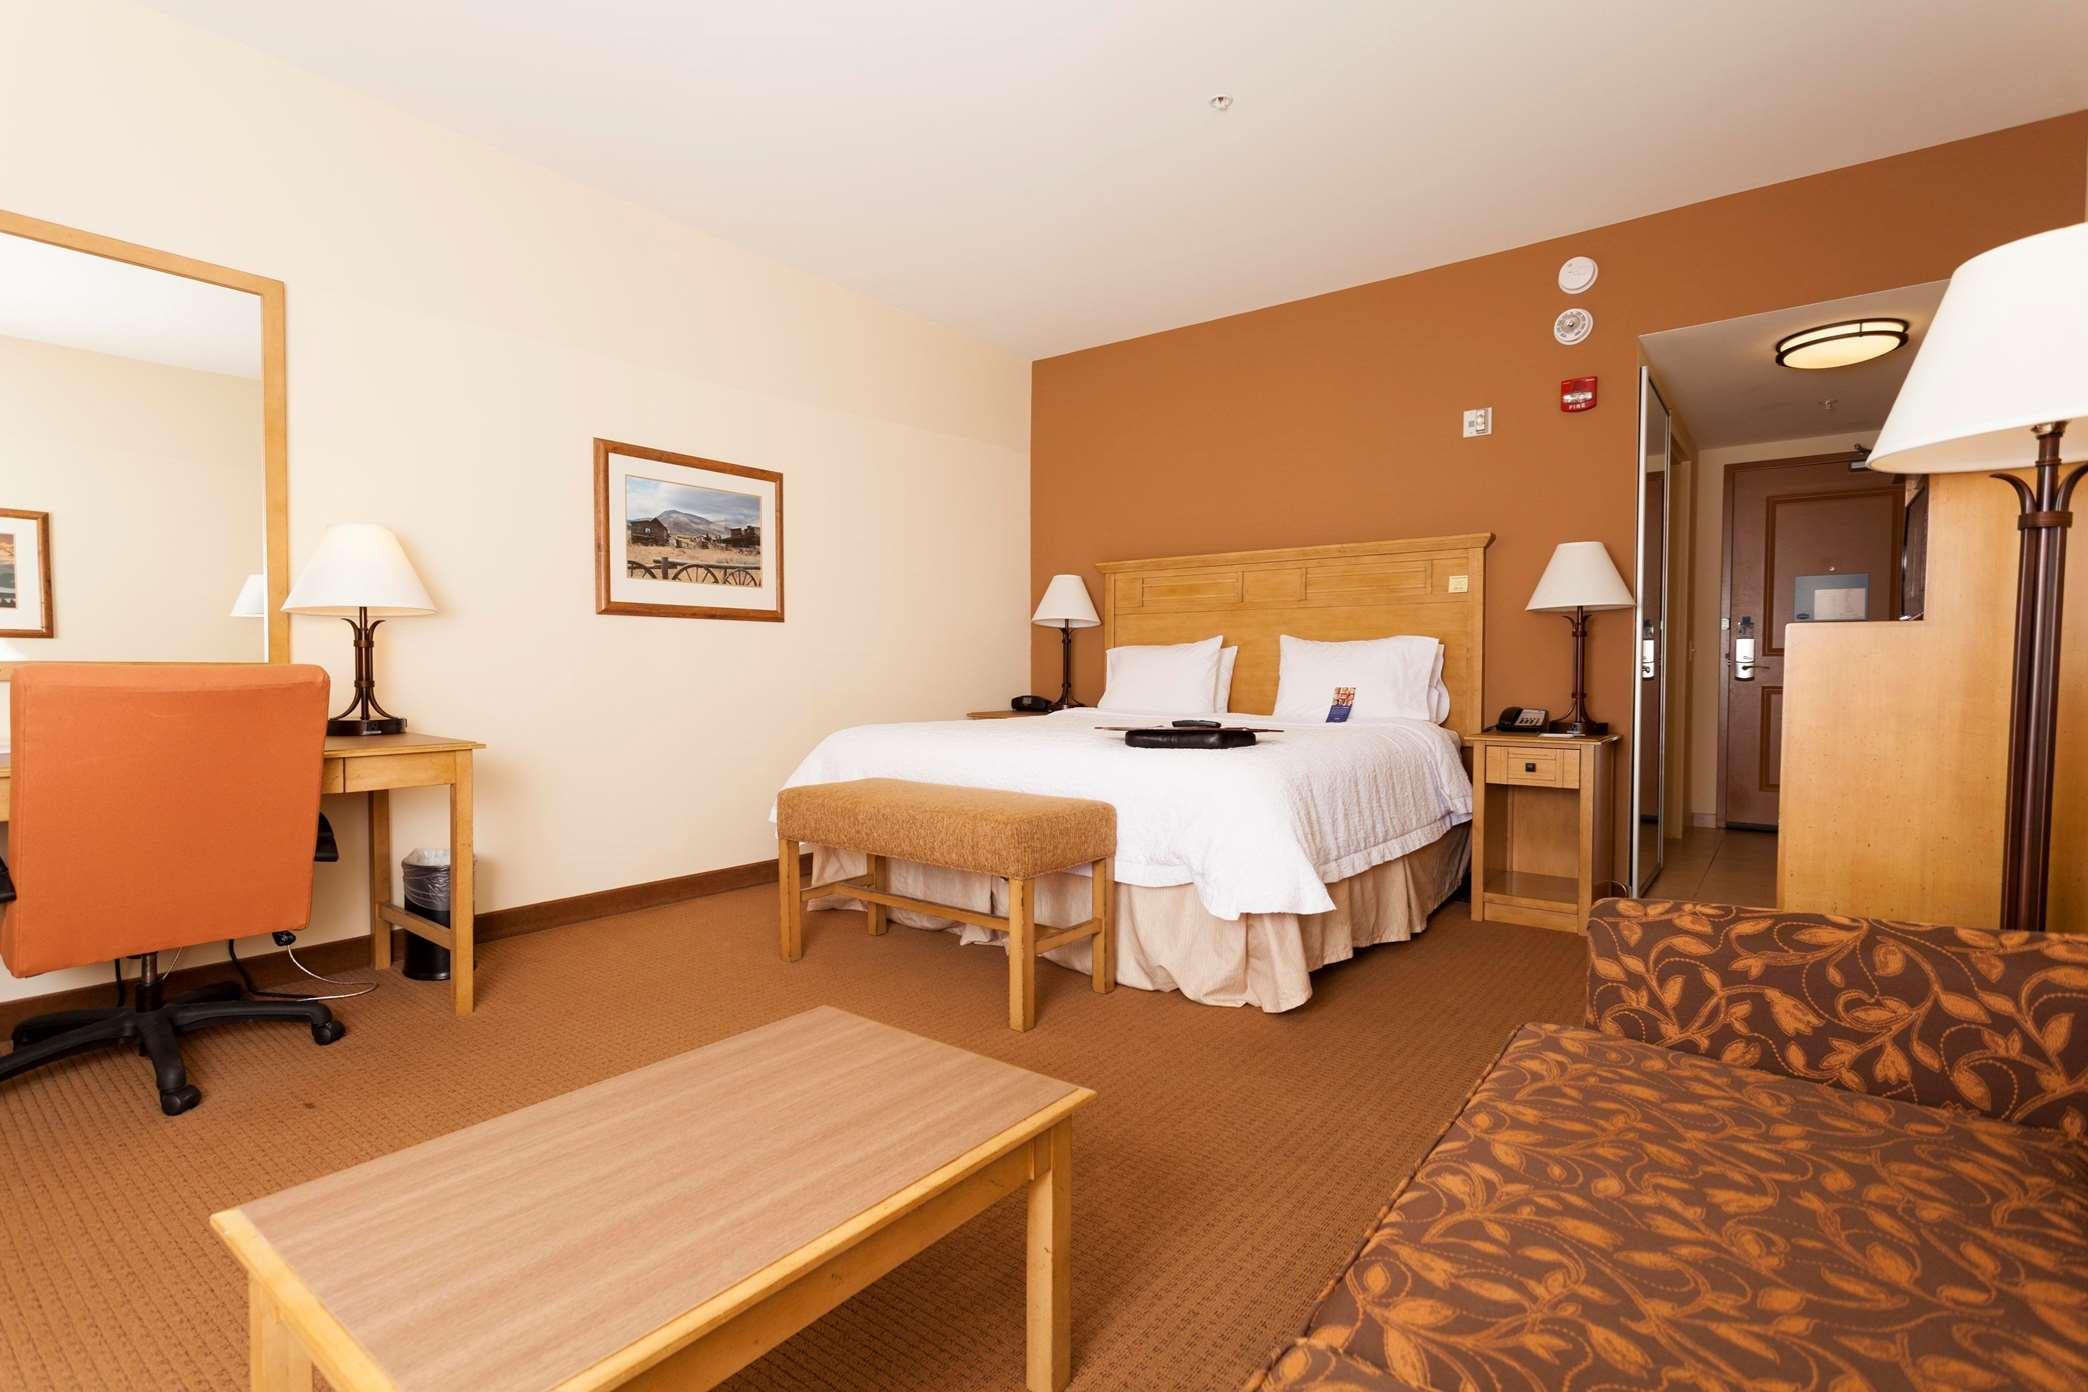 Hampton Inn & Suites Riverton image 35